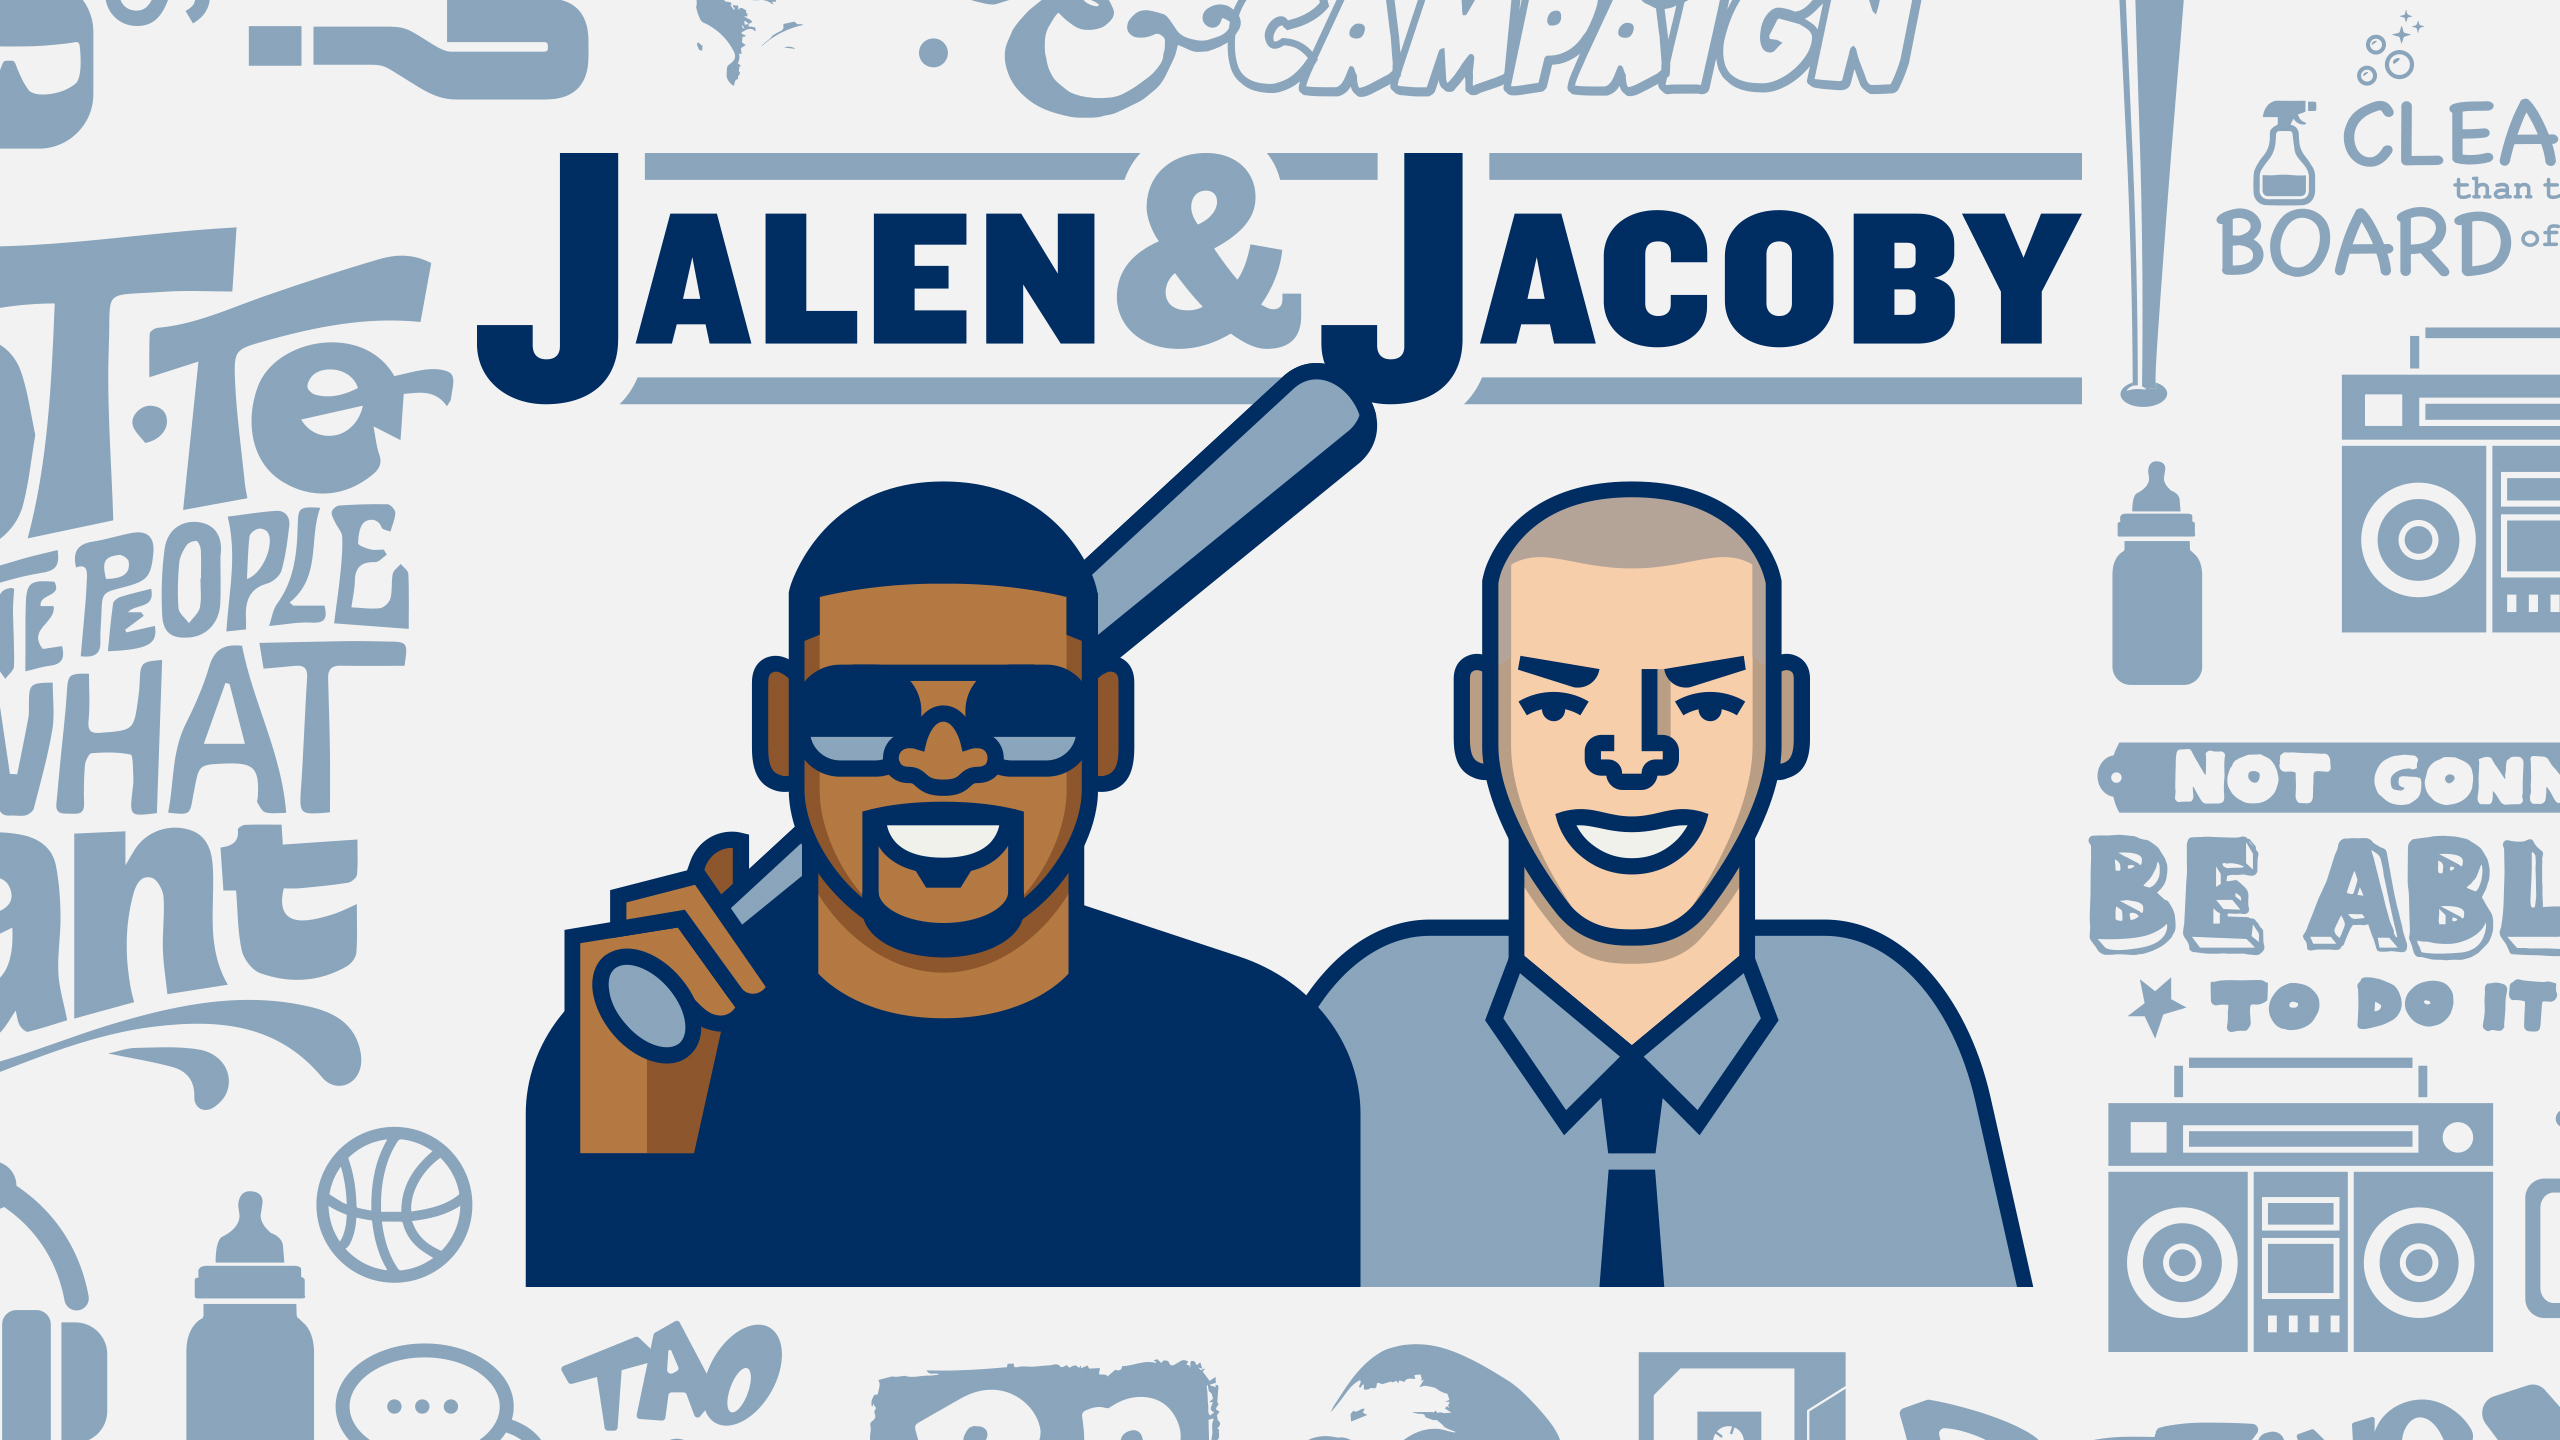 Mon, 3/25 - Jalen & Jacoby